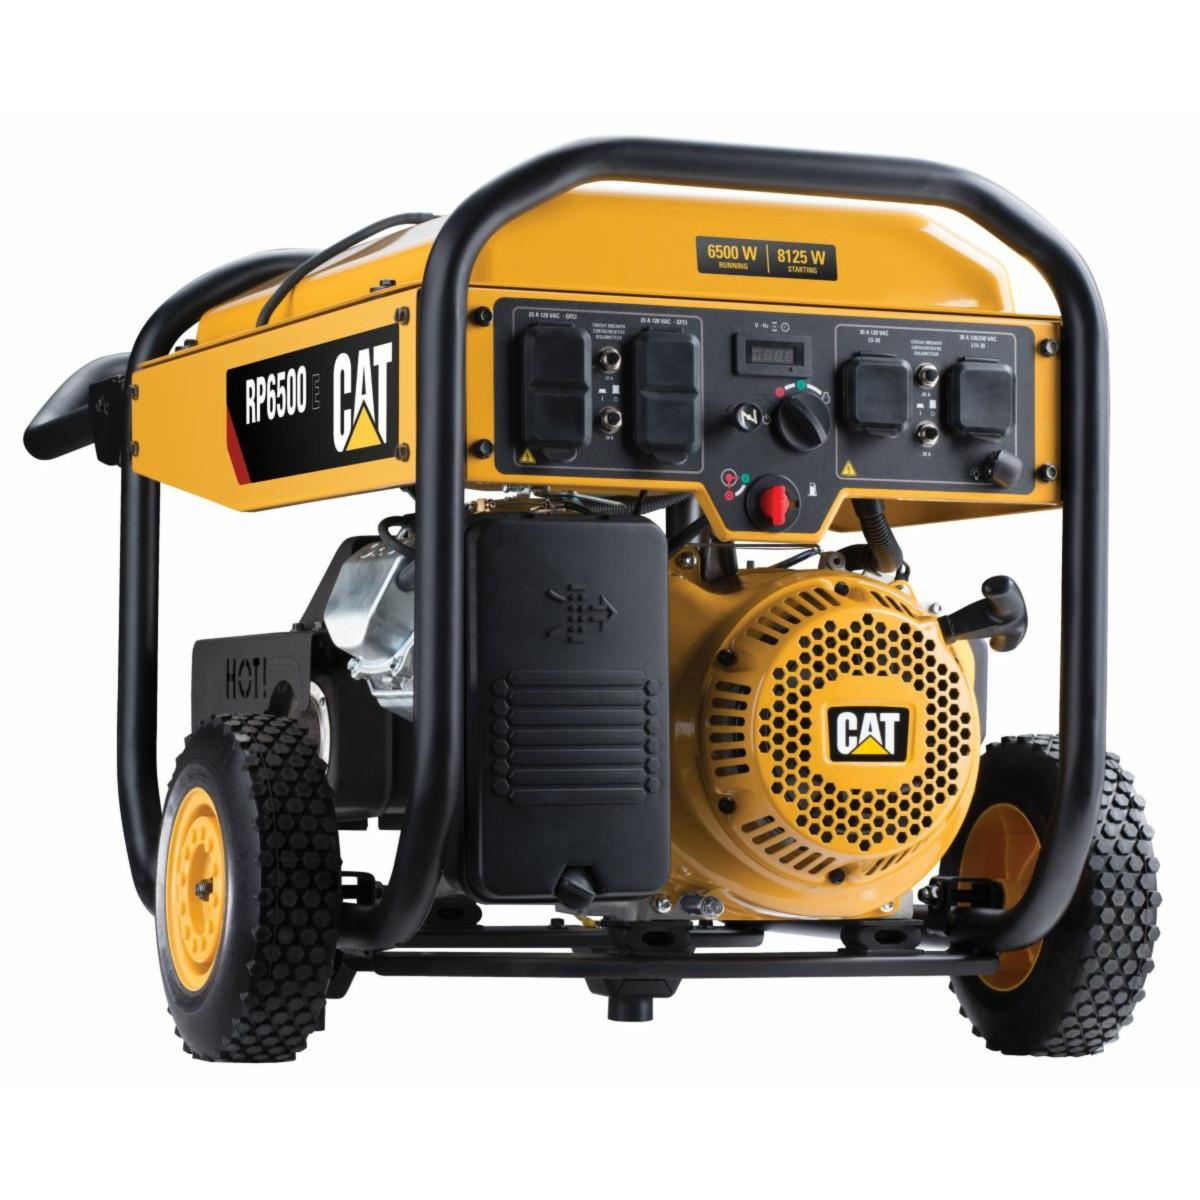 CAT RP6500E 6500W Electric Start Portable Generator